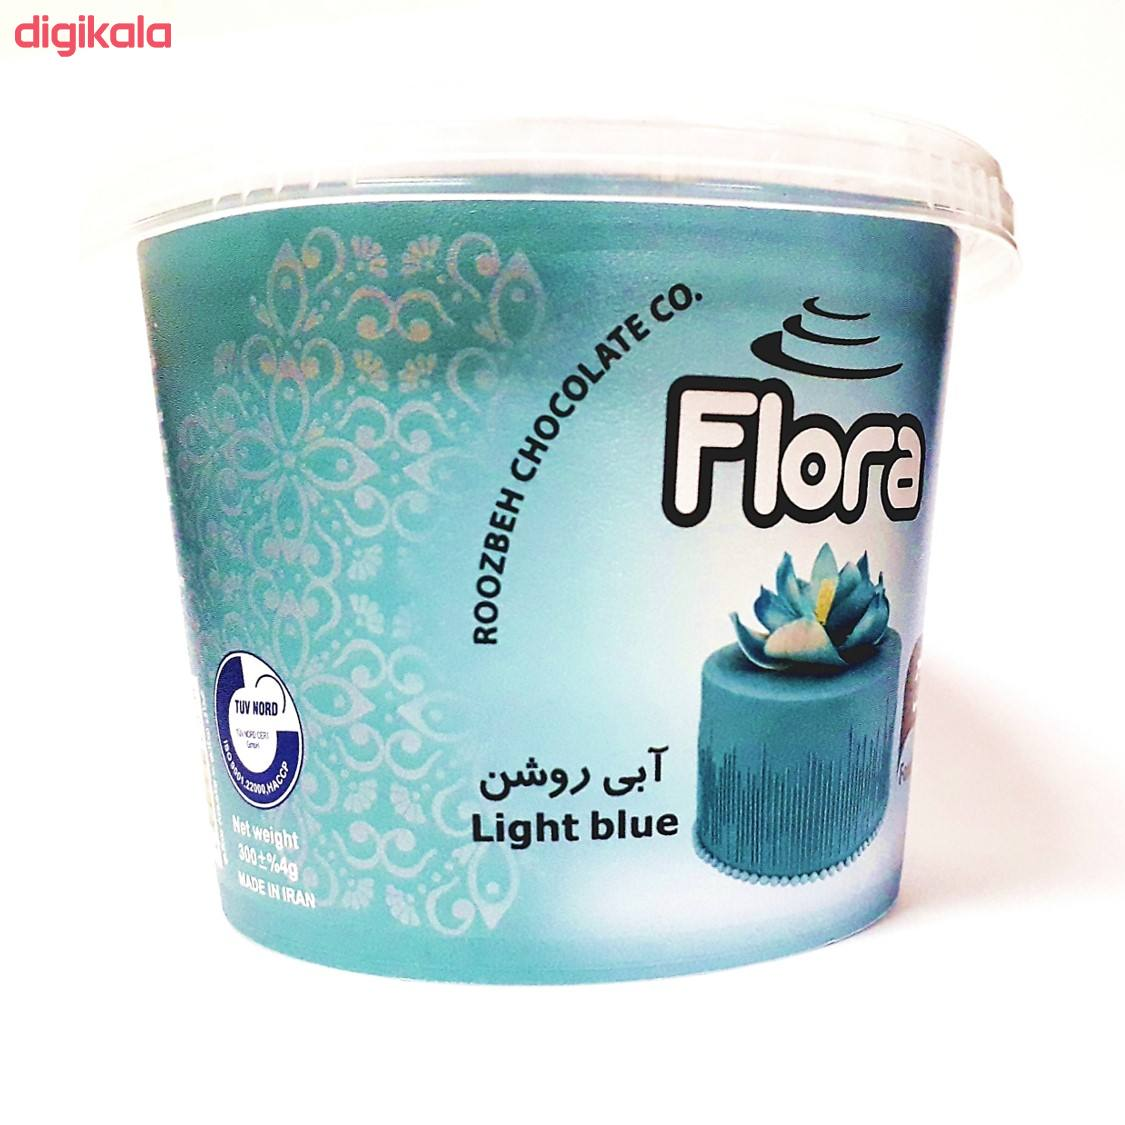 خمیر فوندانت آبی روشن فلورا - 300 گرم main 1 1